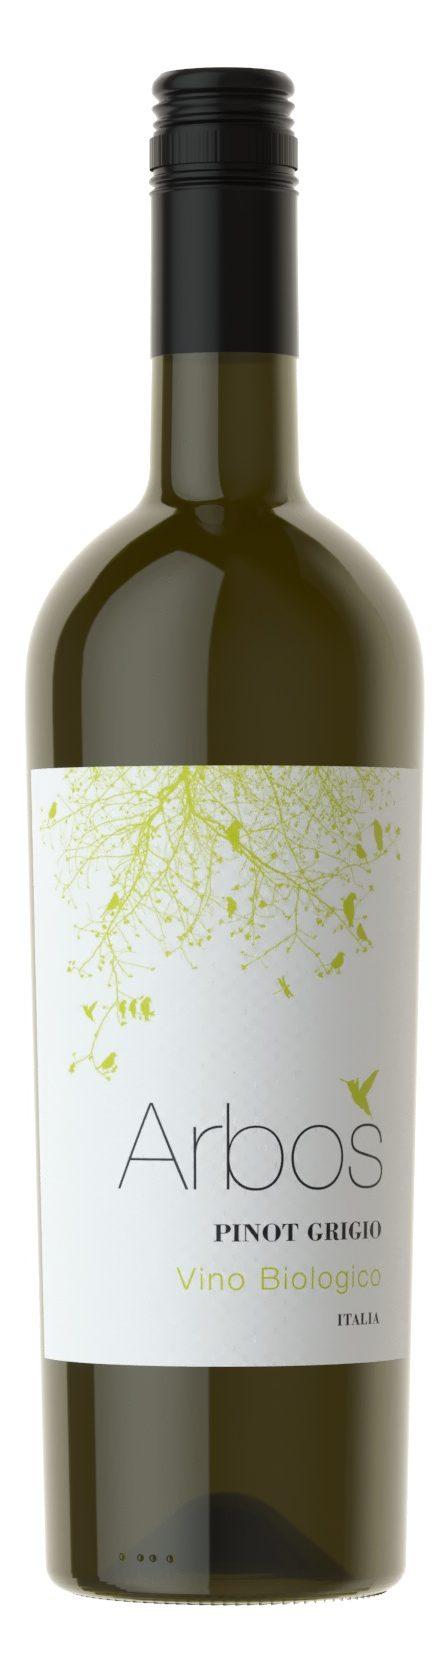 Arbos Pinot Grigio Vino Biologico | Wijnenwereld.nl